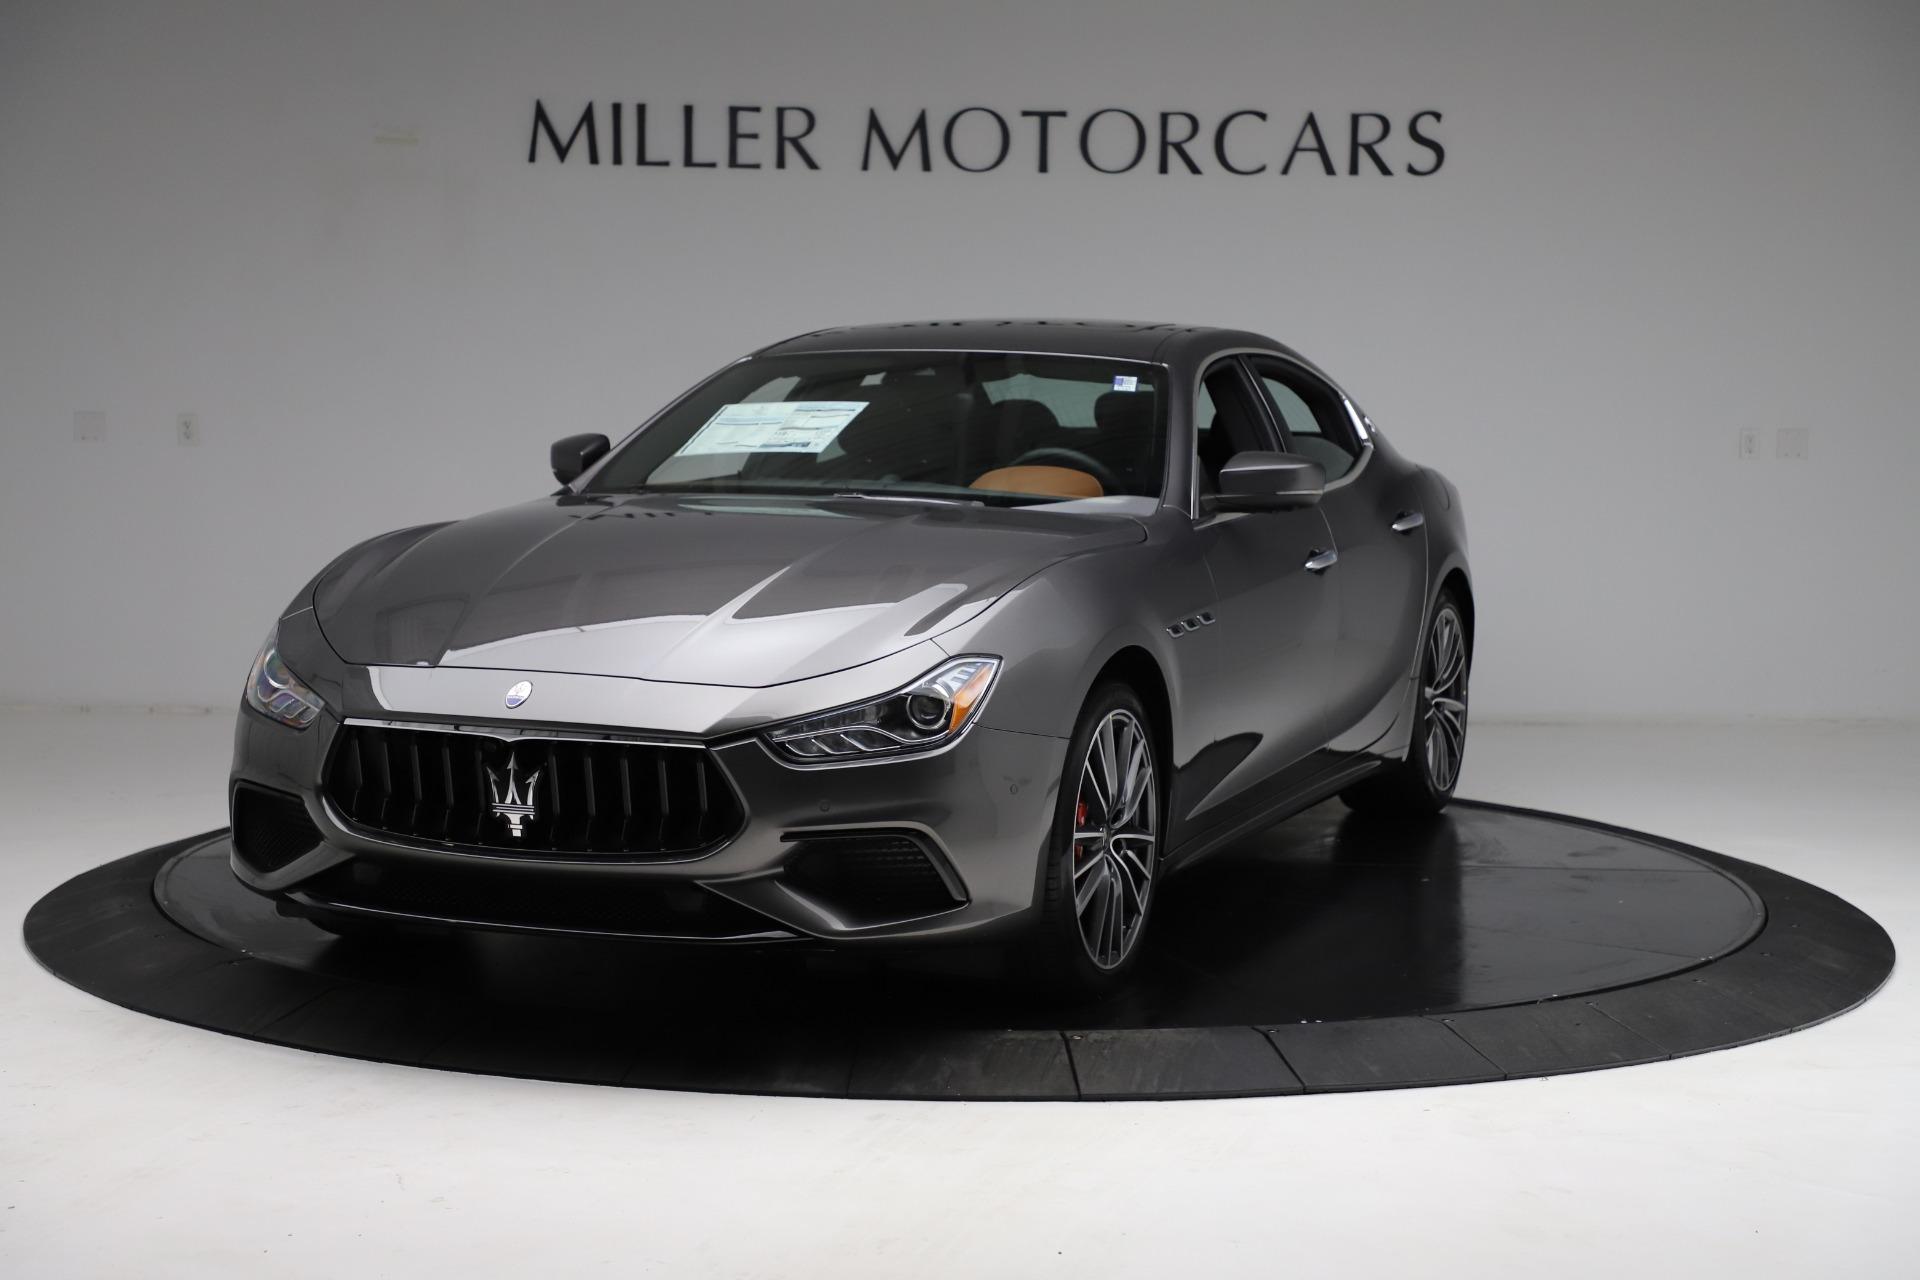 New 2021 Maserati Ghibli S Q4 for sale $90,525 at Rolls-Royce Motor Cars Greenwich in Greenwich CT 06830 1